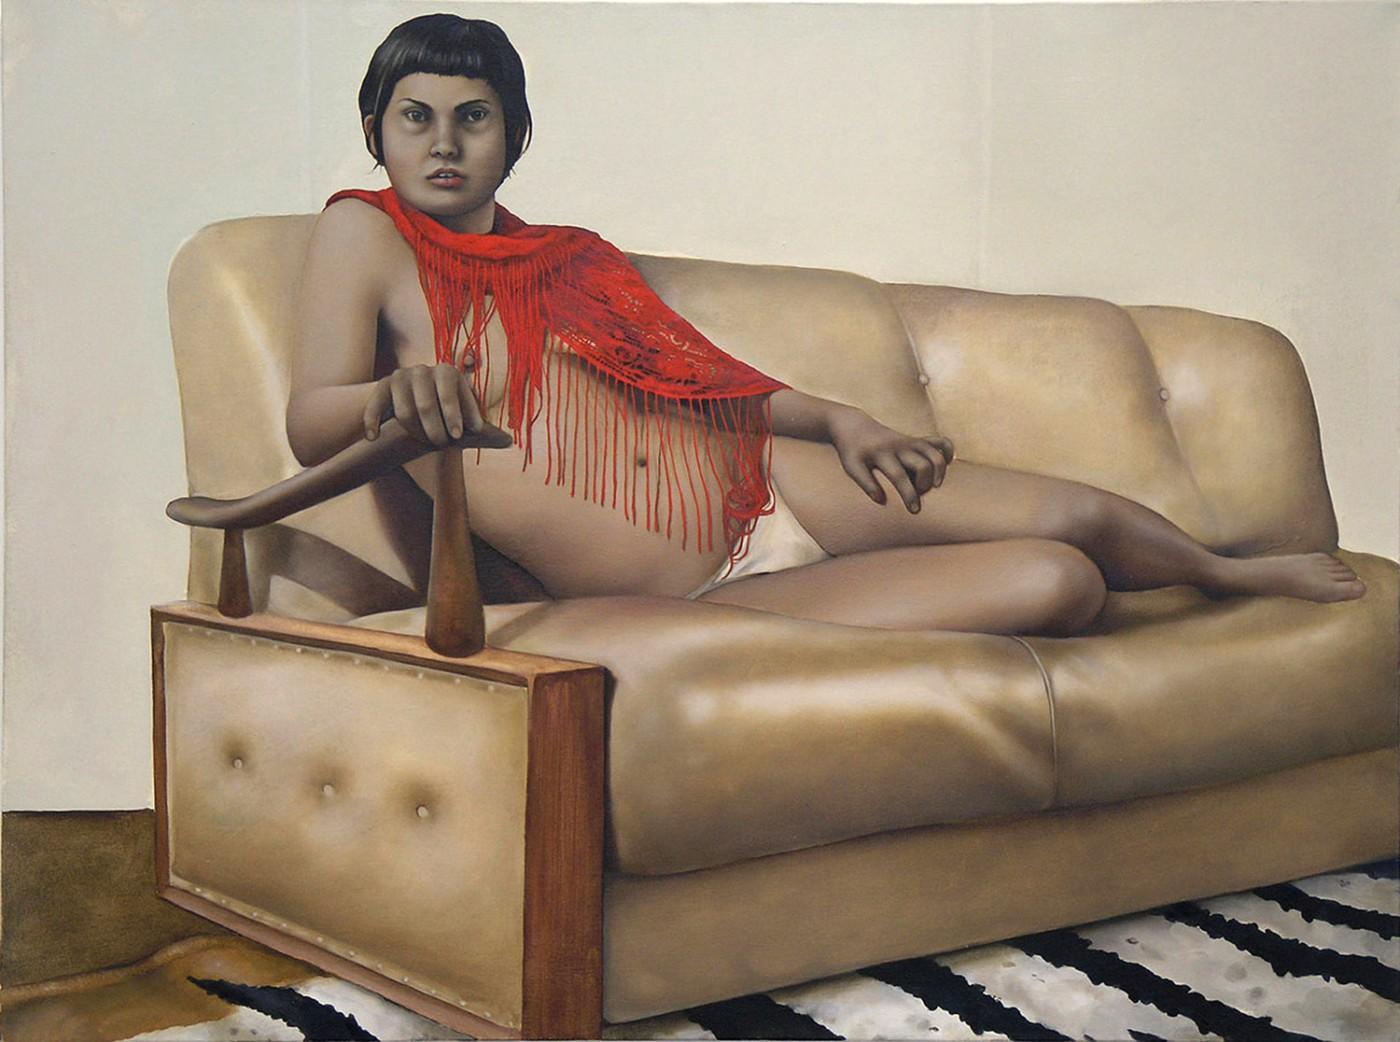 ANNIKA KOOPS skin like vinyl 2005 oil on Canvas 99 x 129 cm